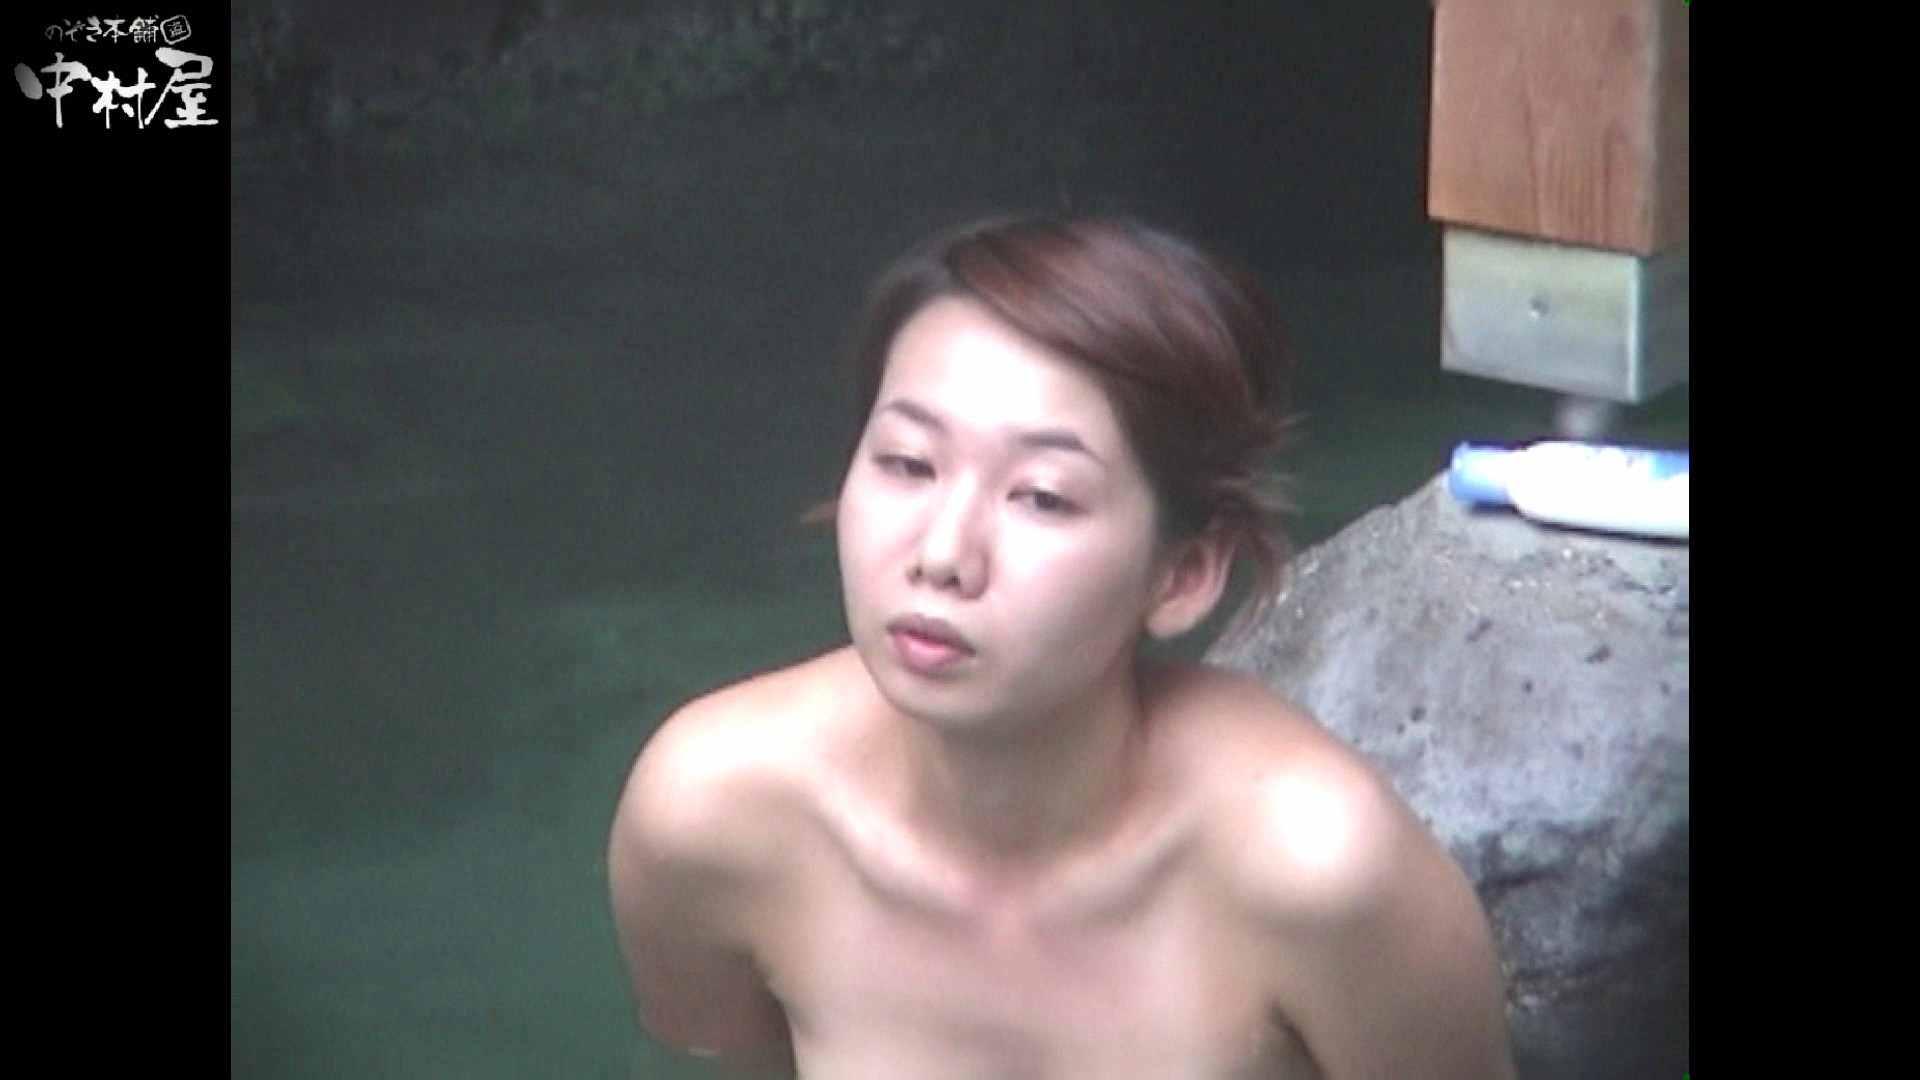 Aquaな露天風呂Vol.951 盗撮師作品  96pic 57